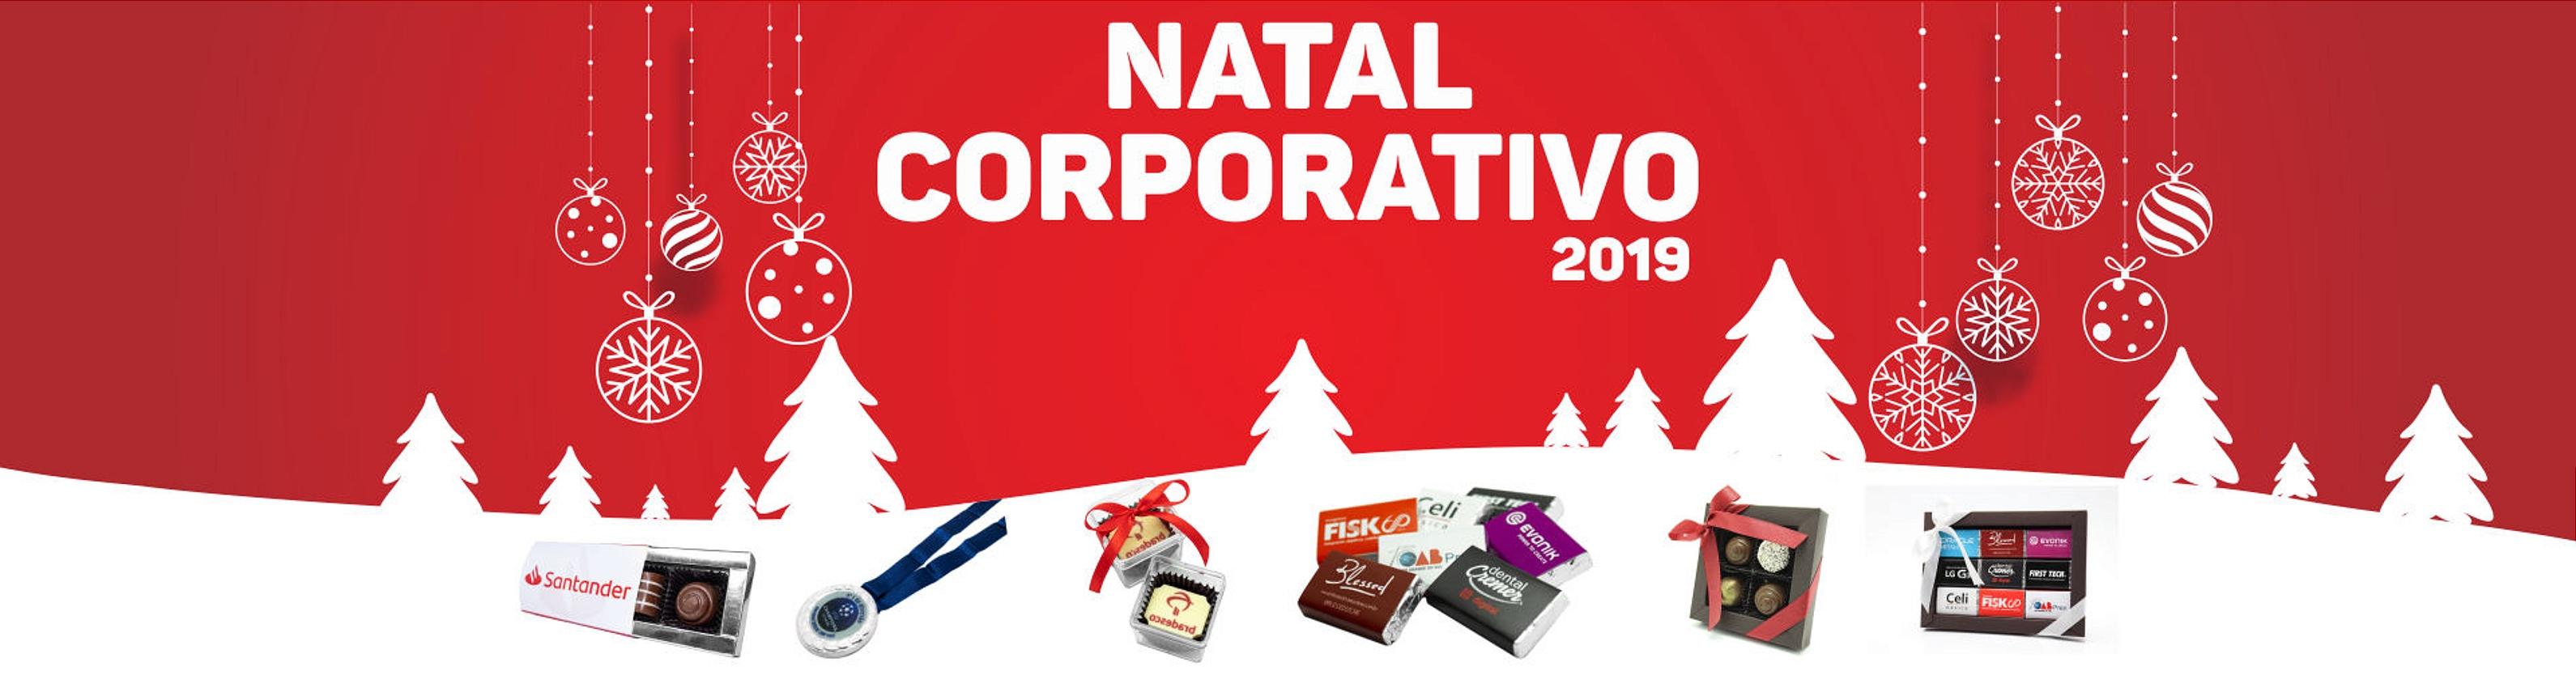 Natal Corporativo 2019